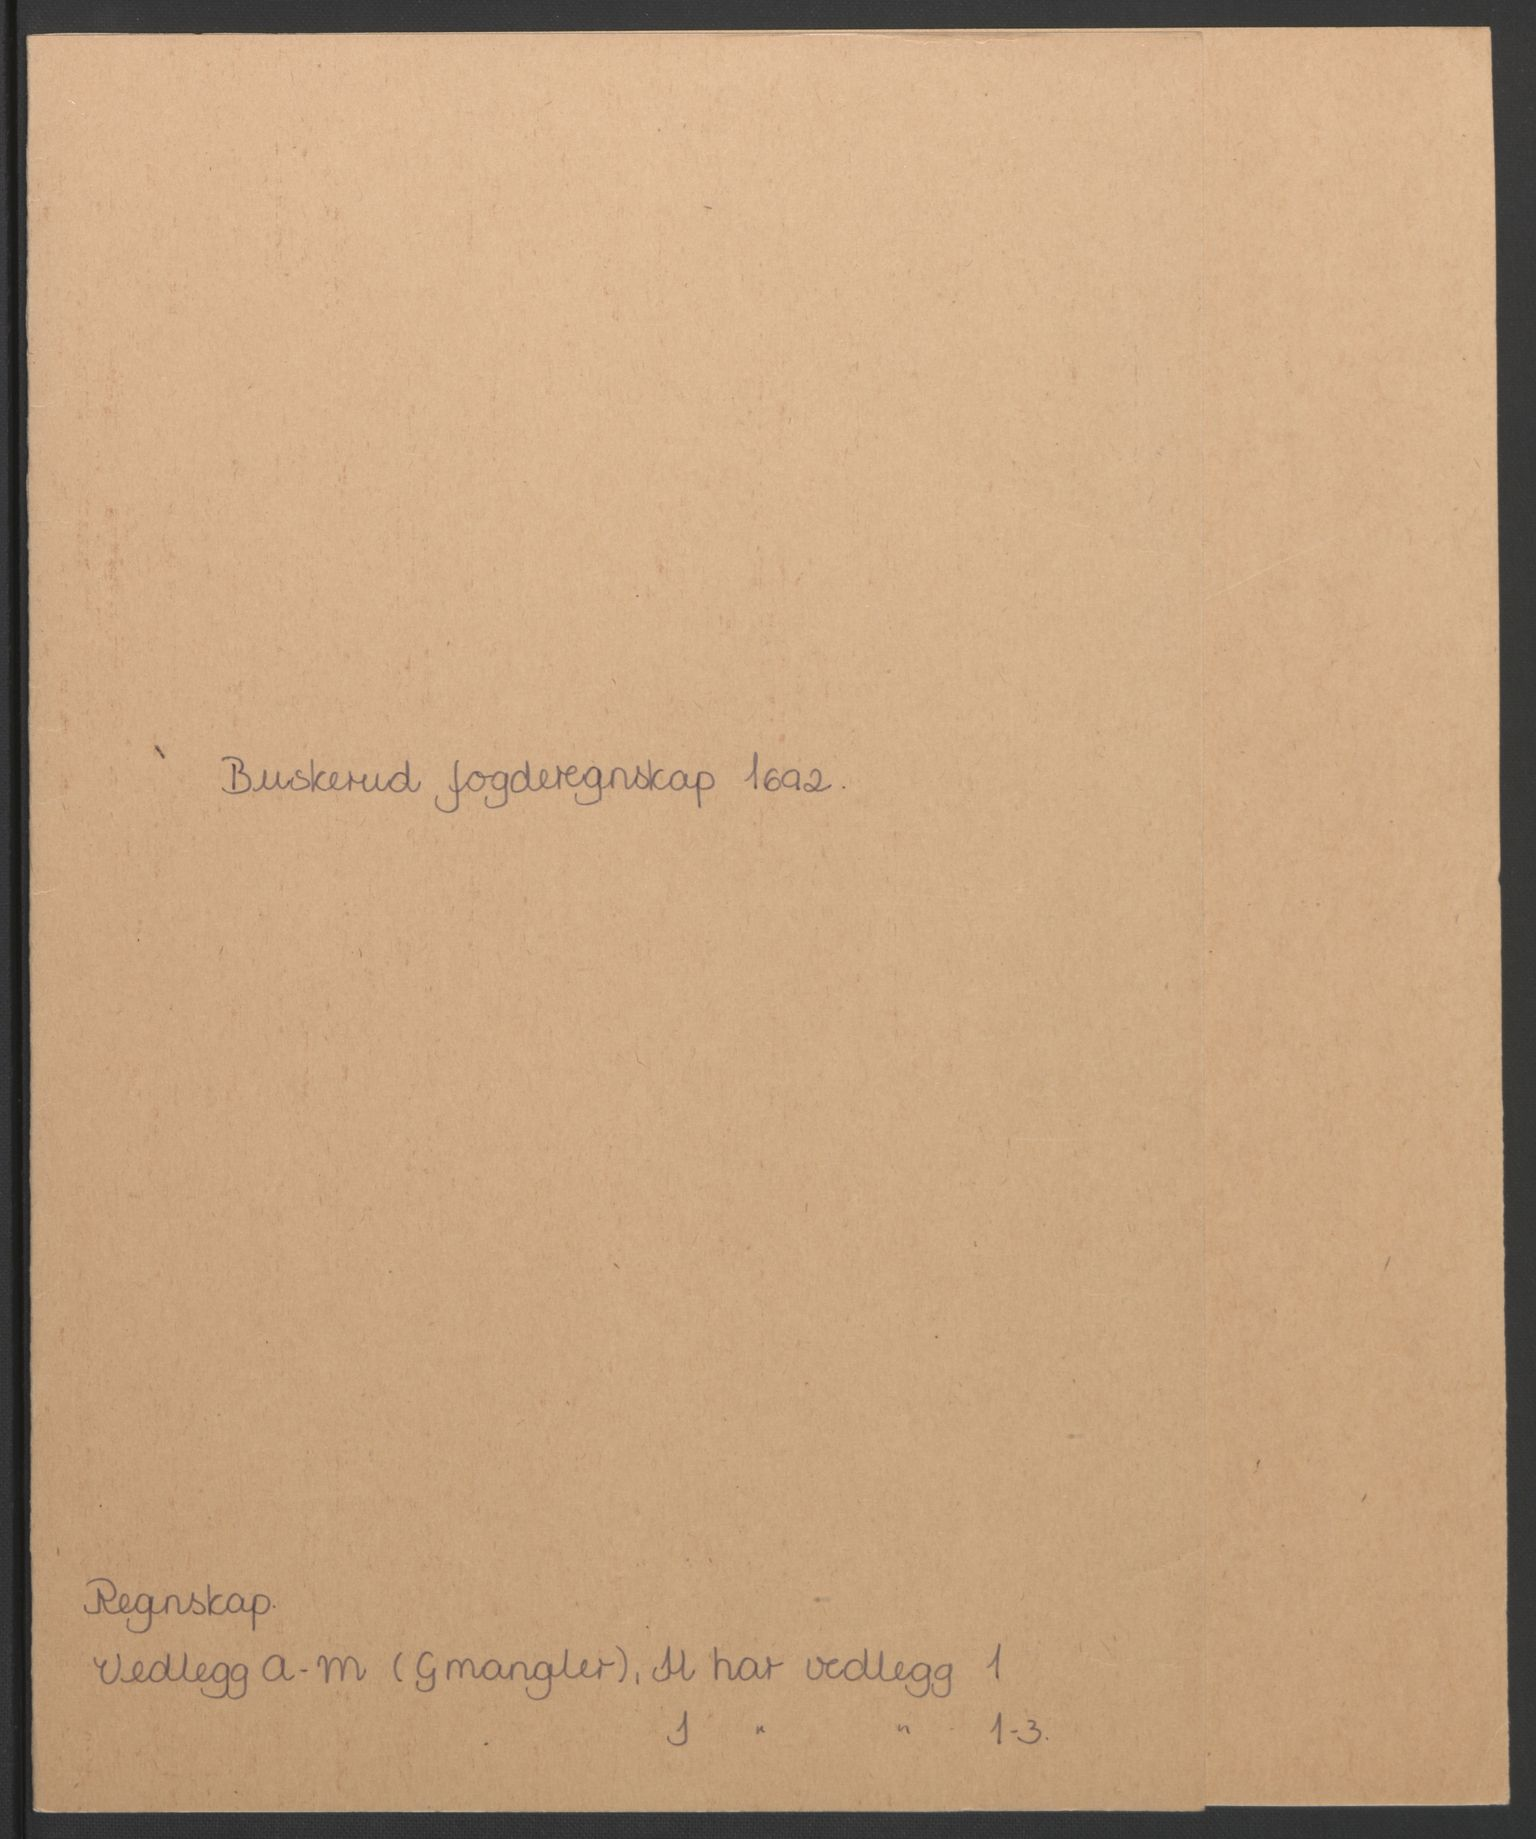 RA, Rentekammeret inntil 1814, Reviderte regnskaper, Fogderegnskap, R25/L1681: Fogderegnskap Buskerud, 1691-1692, s. 305